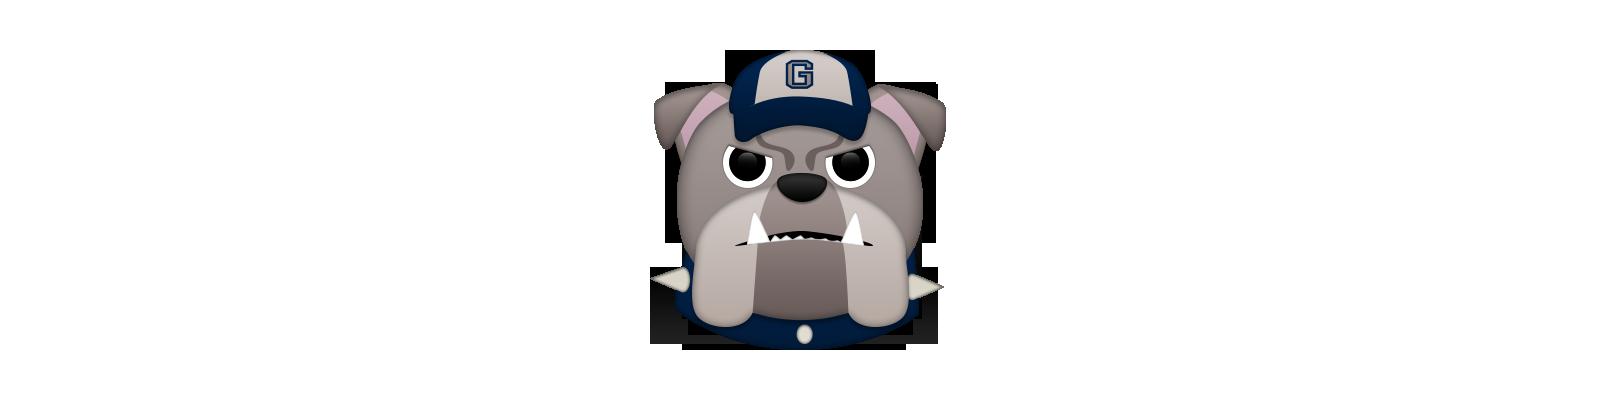 Polka dot bulldog basketball clipart picture free stock Emoji Madness - The Washington Post picture free stock